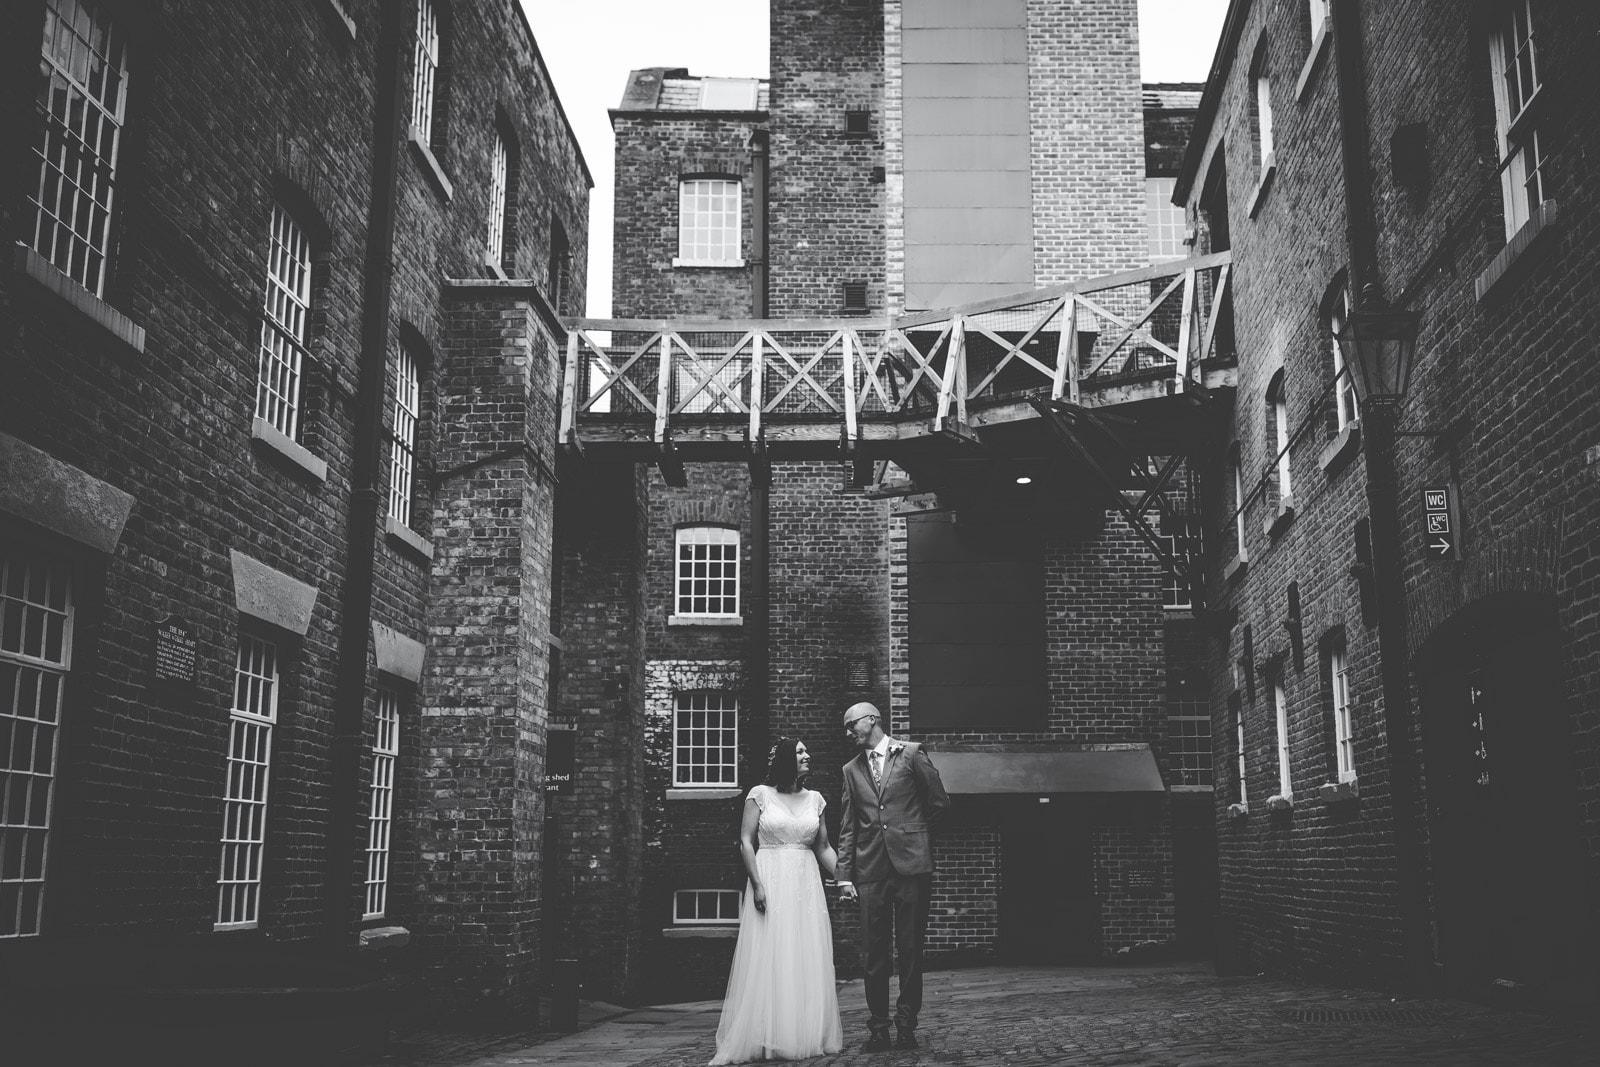 Creative wedding portraits at Quarry Bank Mill